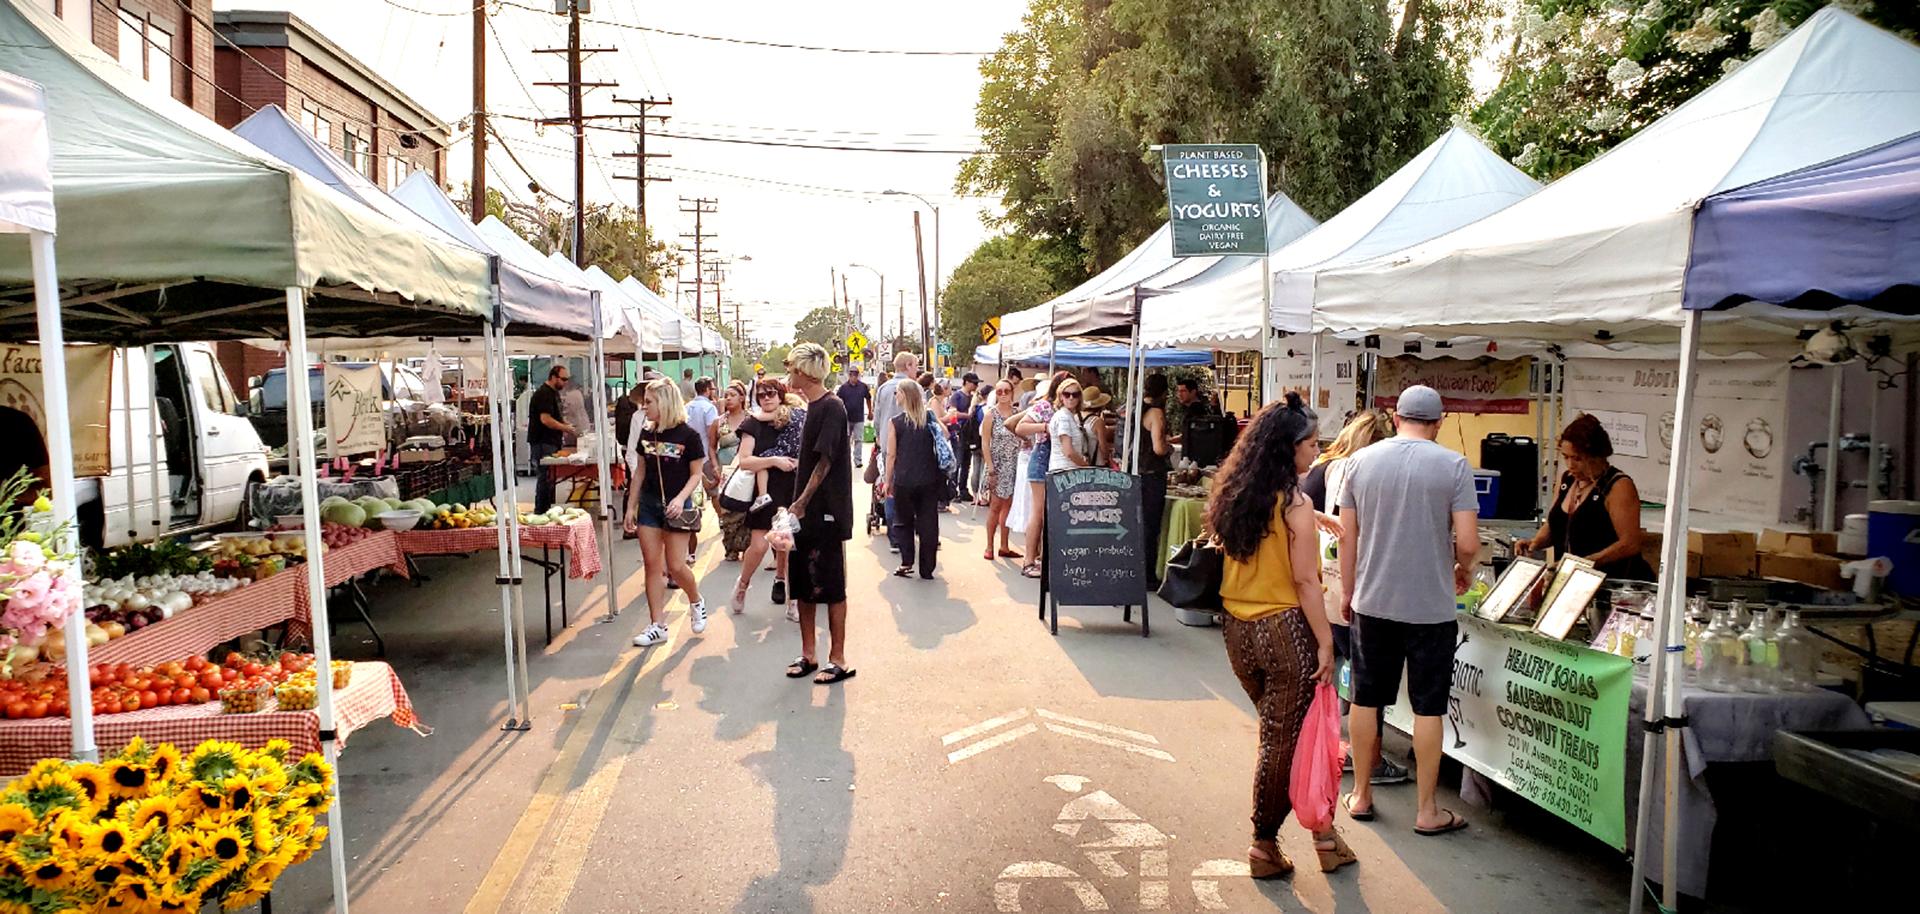 South Pasadena Certified Farmer's Market located at 906 Meridian Avenue, South Pasadena